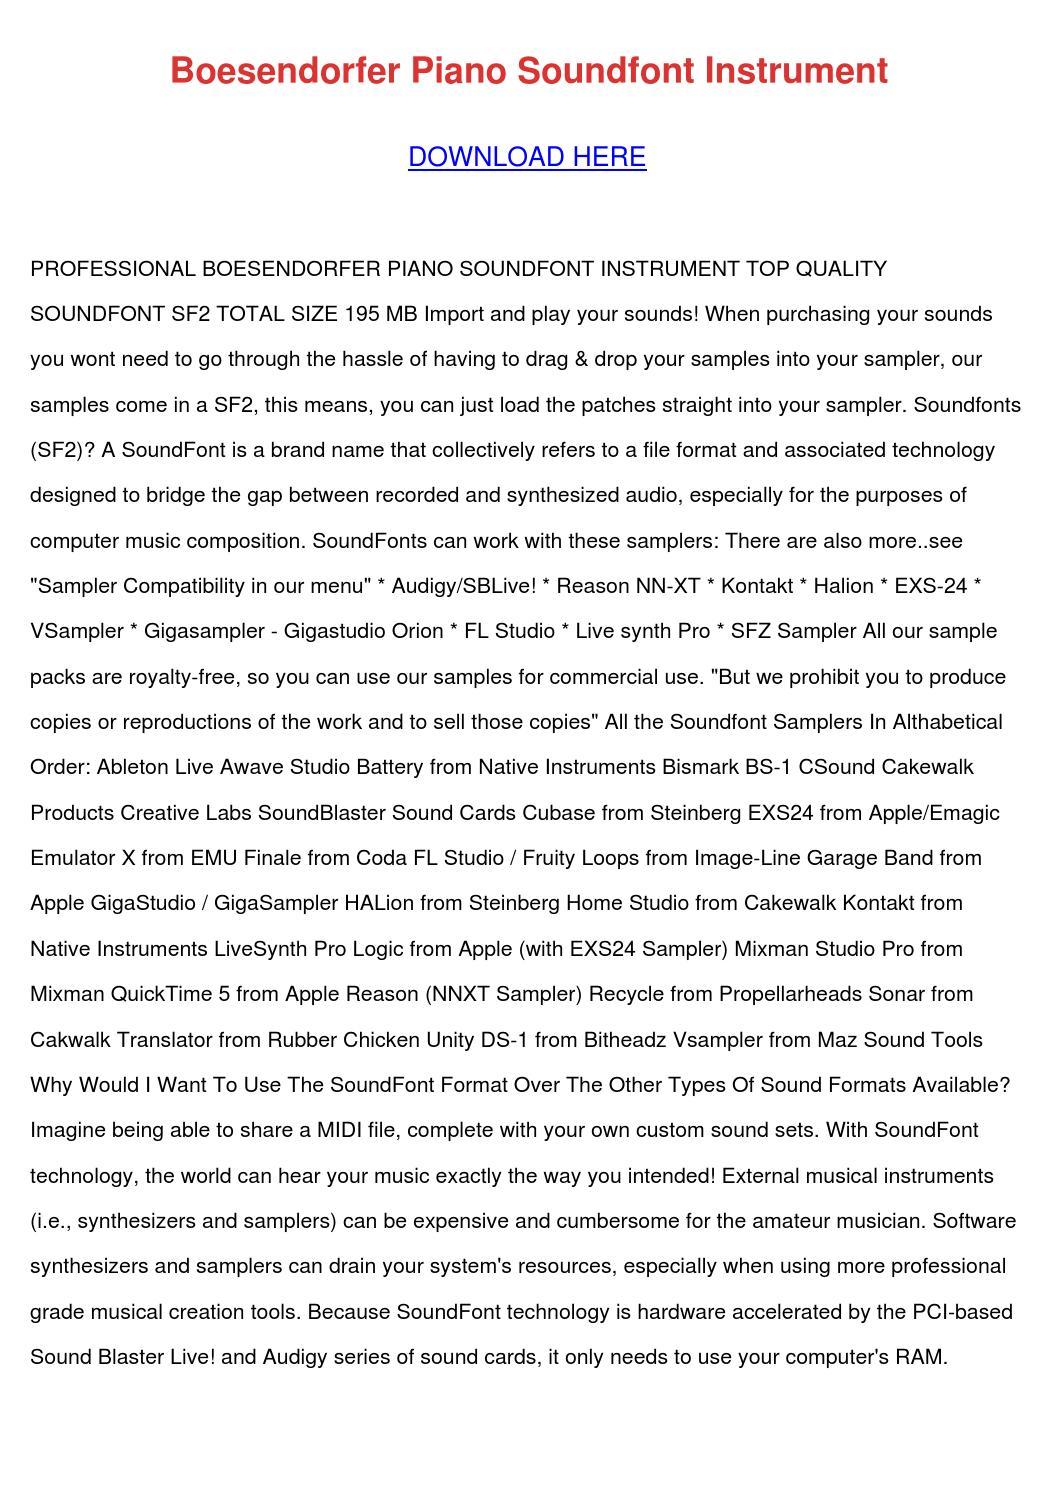 Boesendorfer Piano Soundfont Instrument by KlausJean - issuu